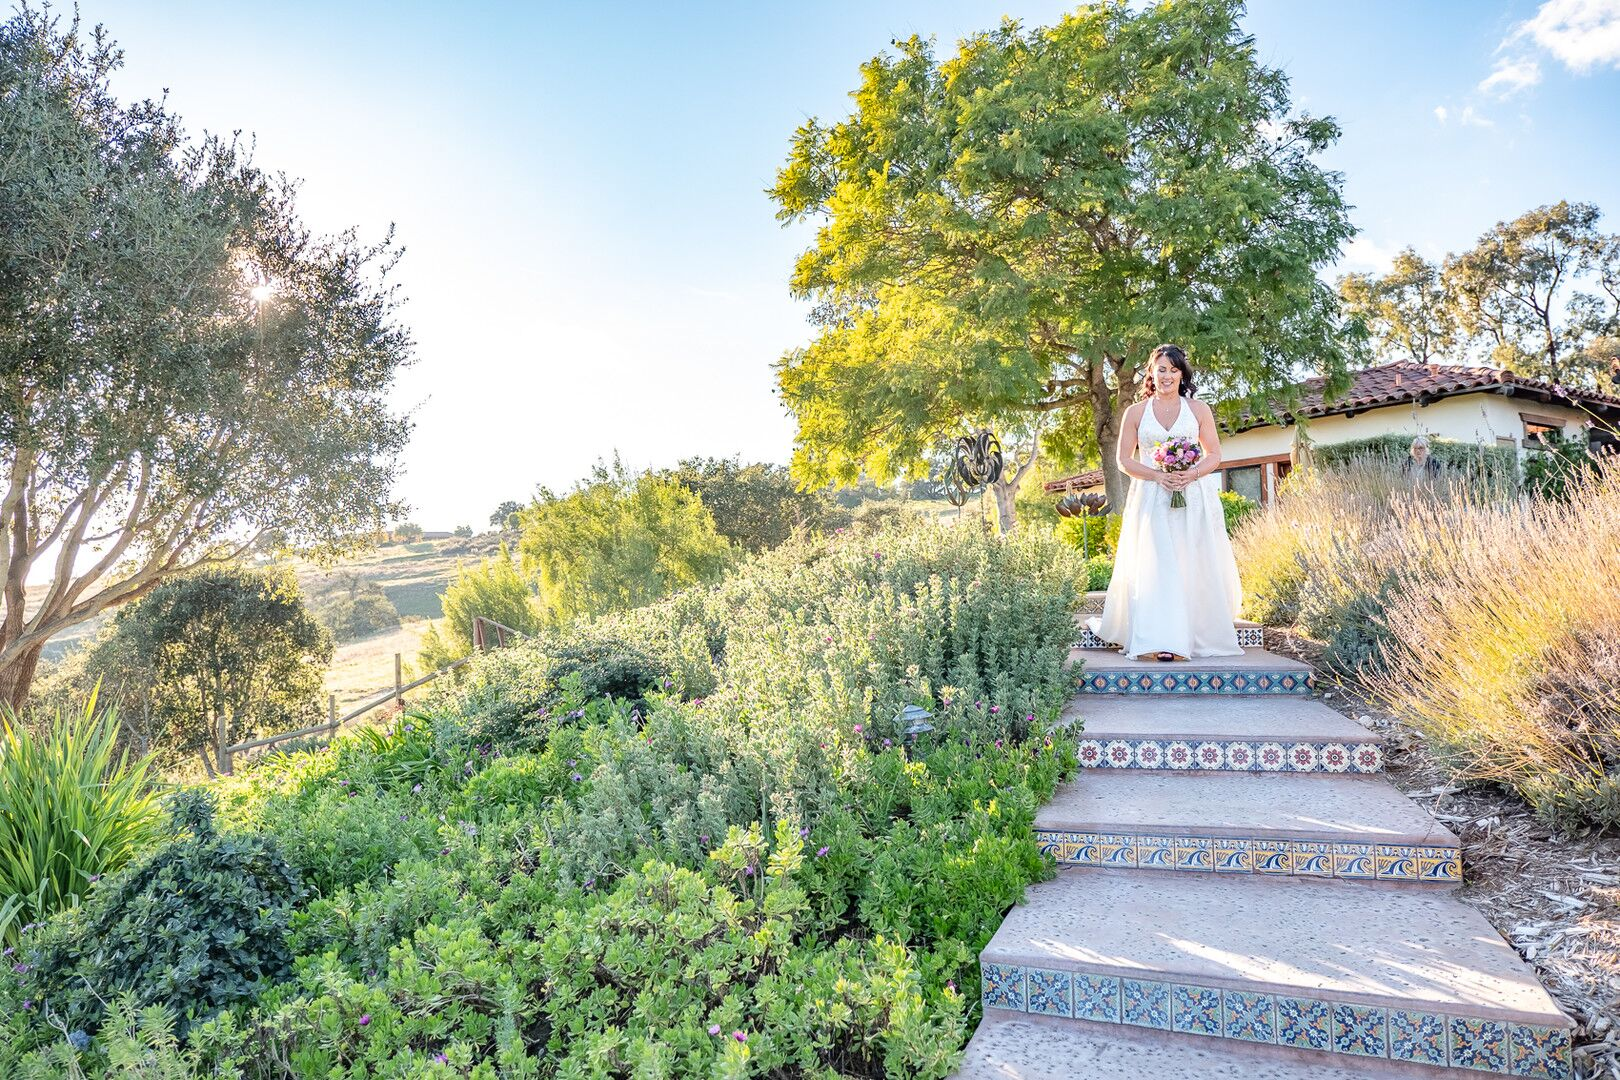 www.santabarbarawedding.com | Venue: The Casitas of Arroyo Grande | Photographer: Renoda Campbell Photography | Second Shooter: John Patrick Images |  Bride on Path